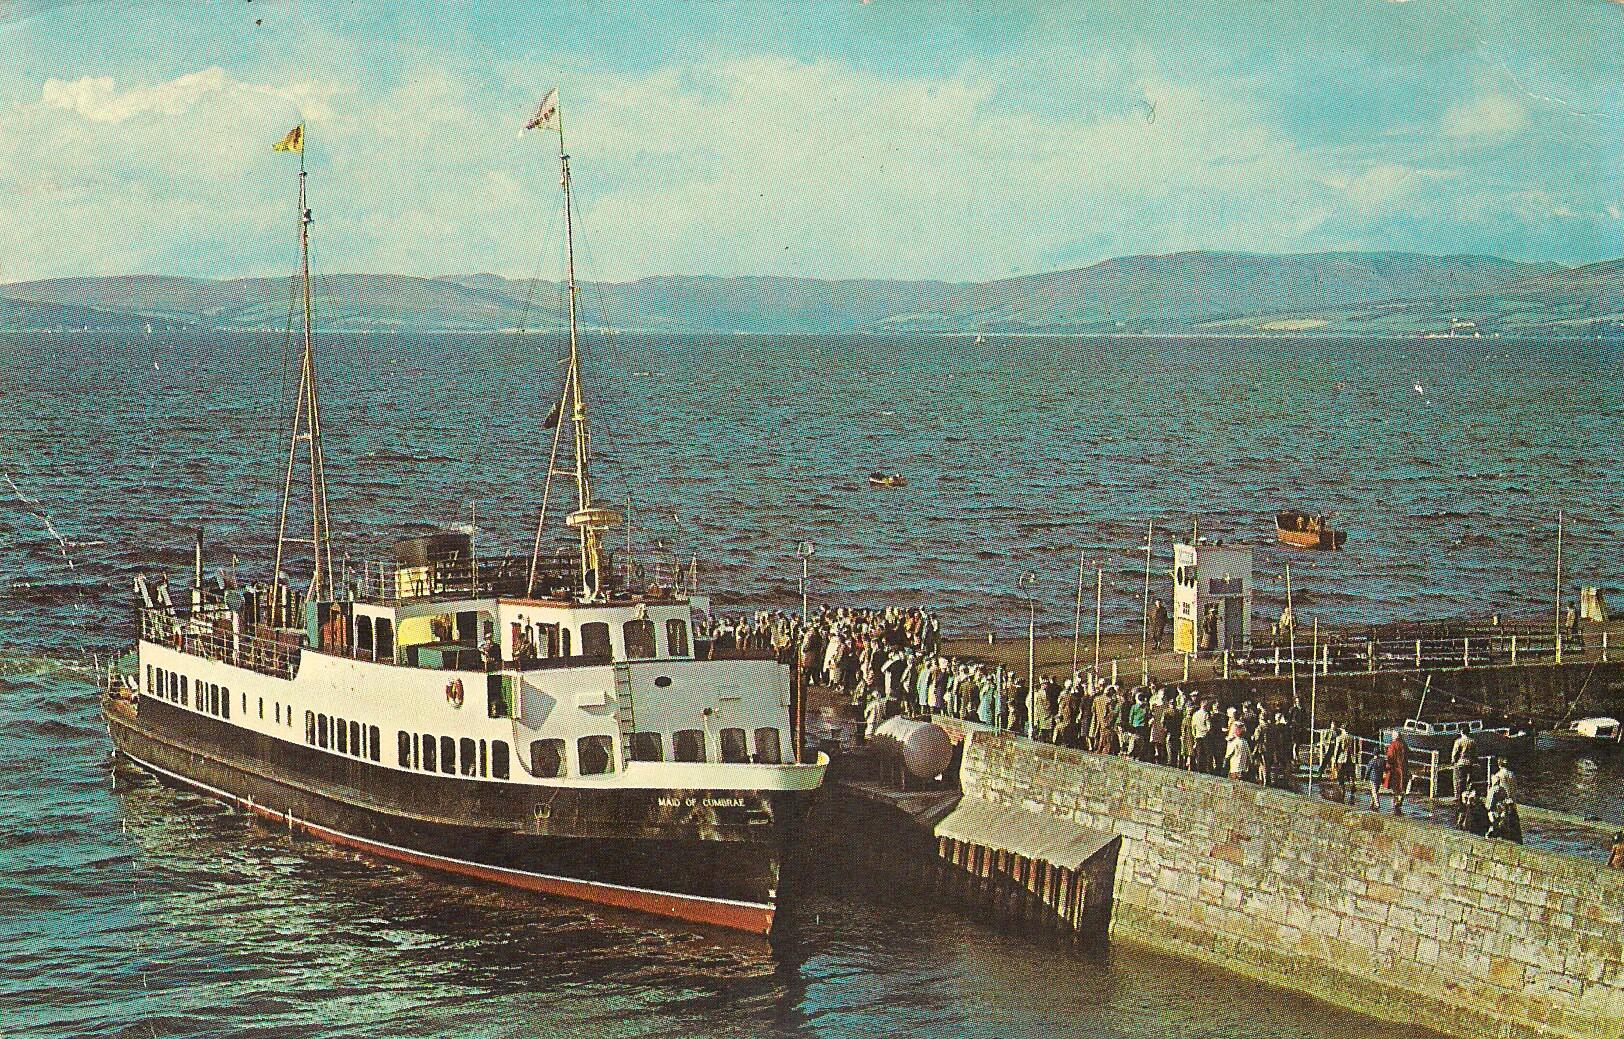 Postcard of Maid of Cumbrae at Largs